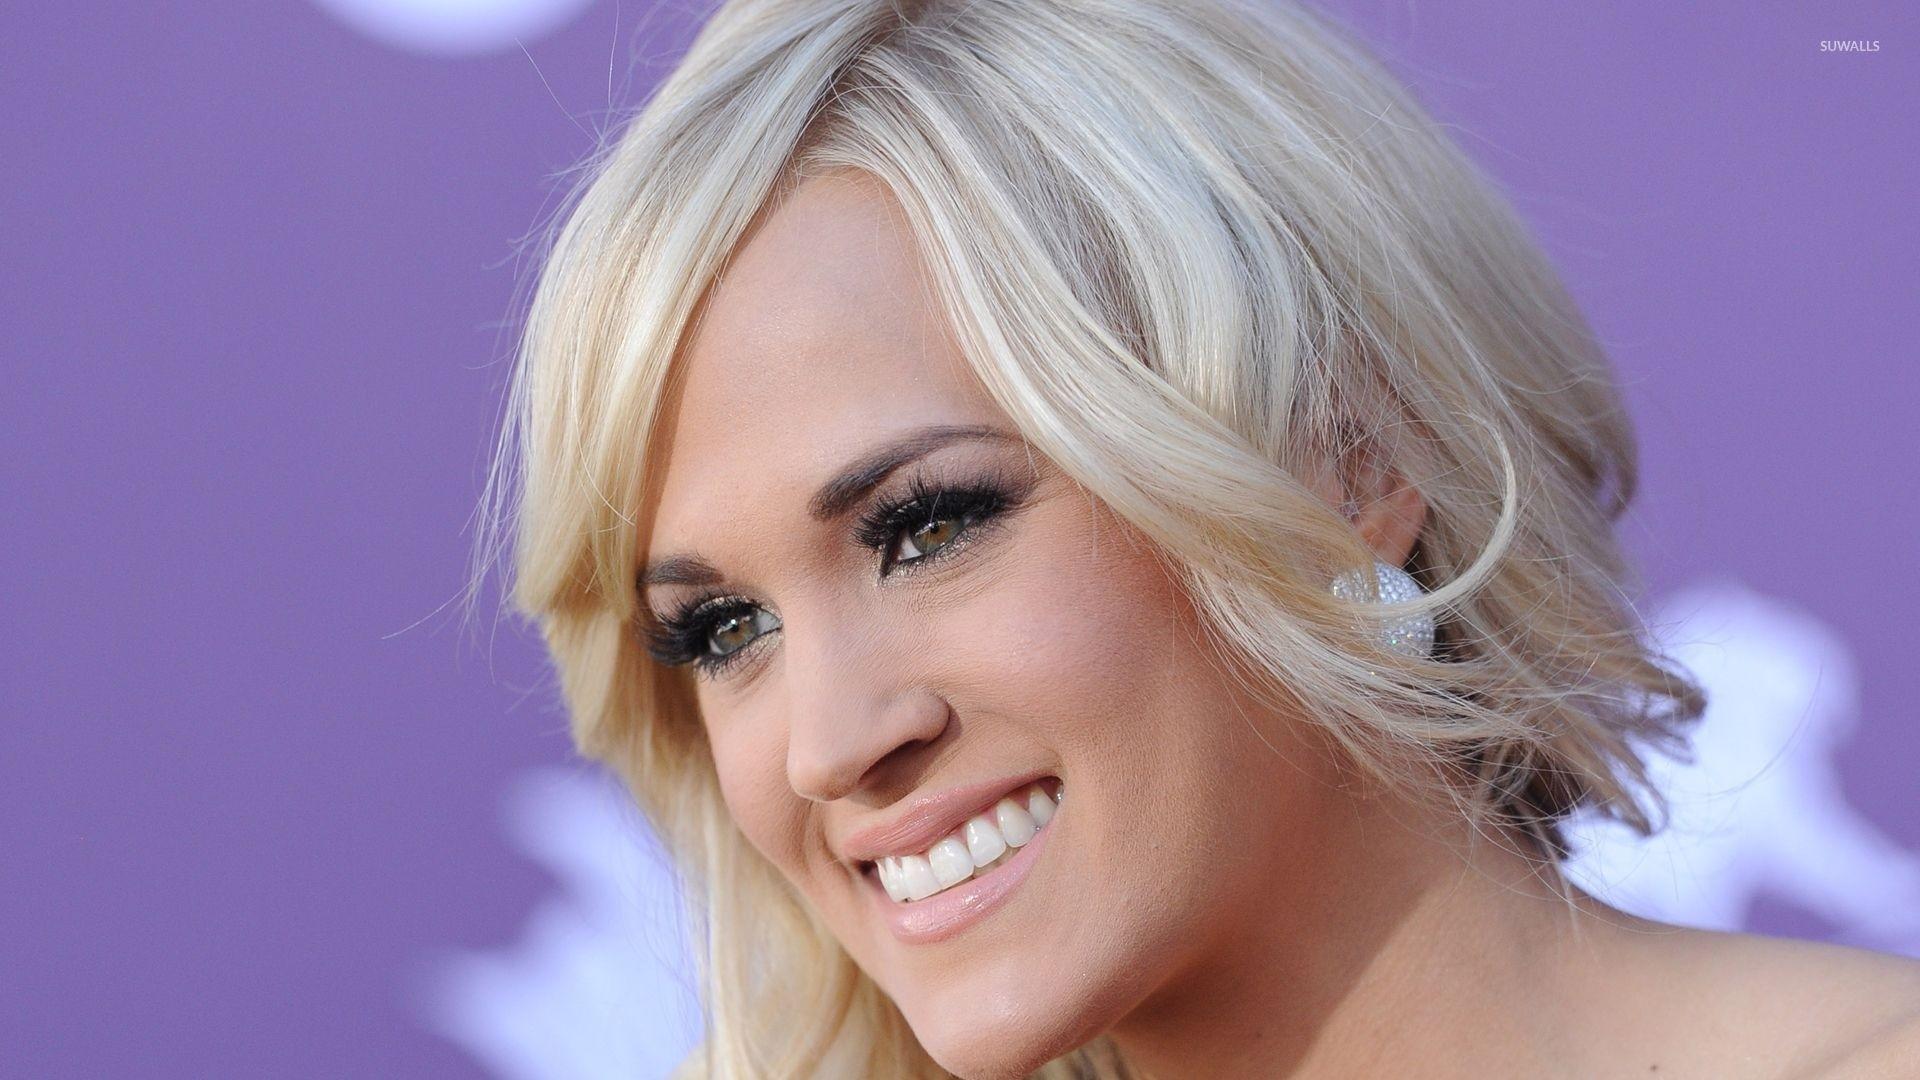 Carrie Underwood wallpaper image